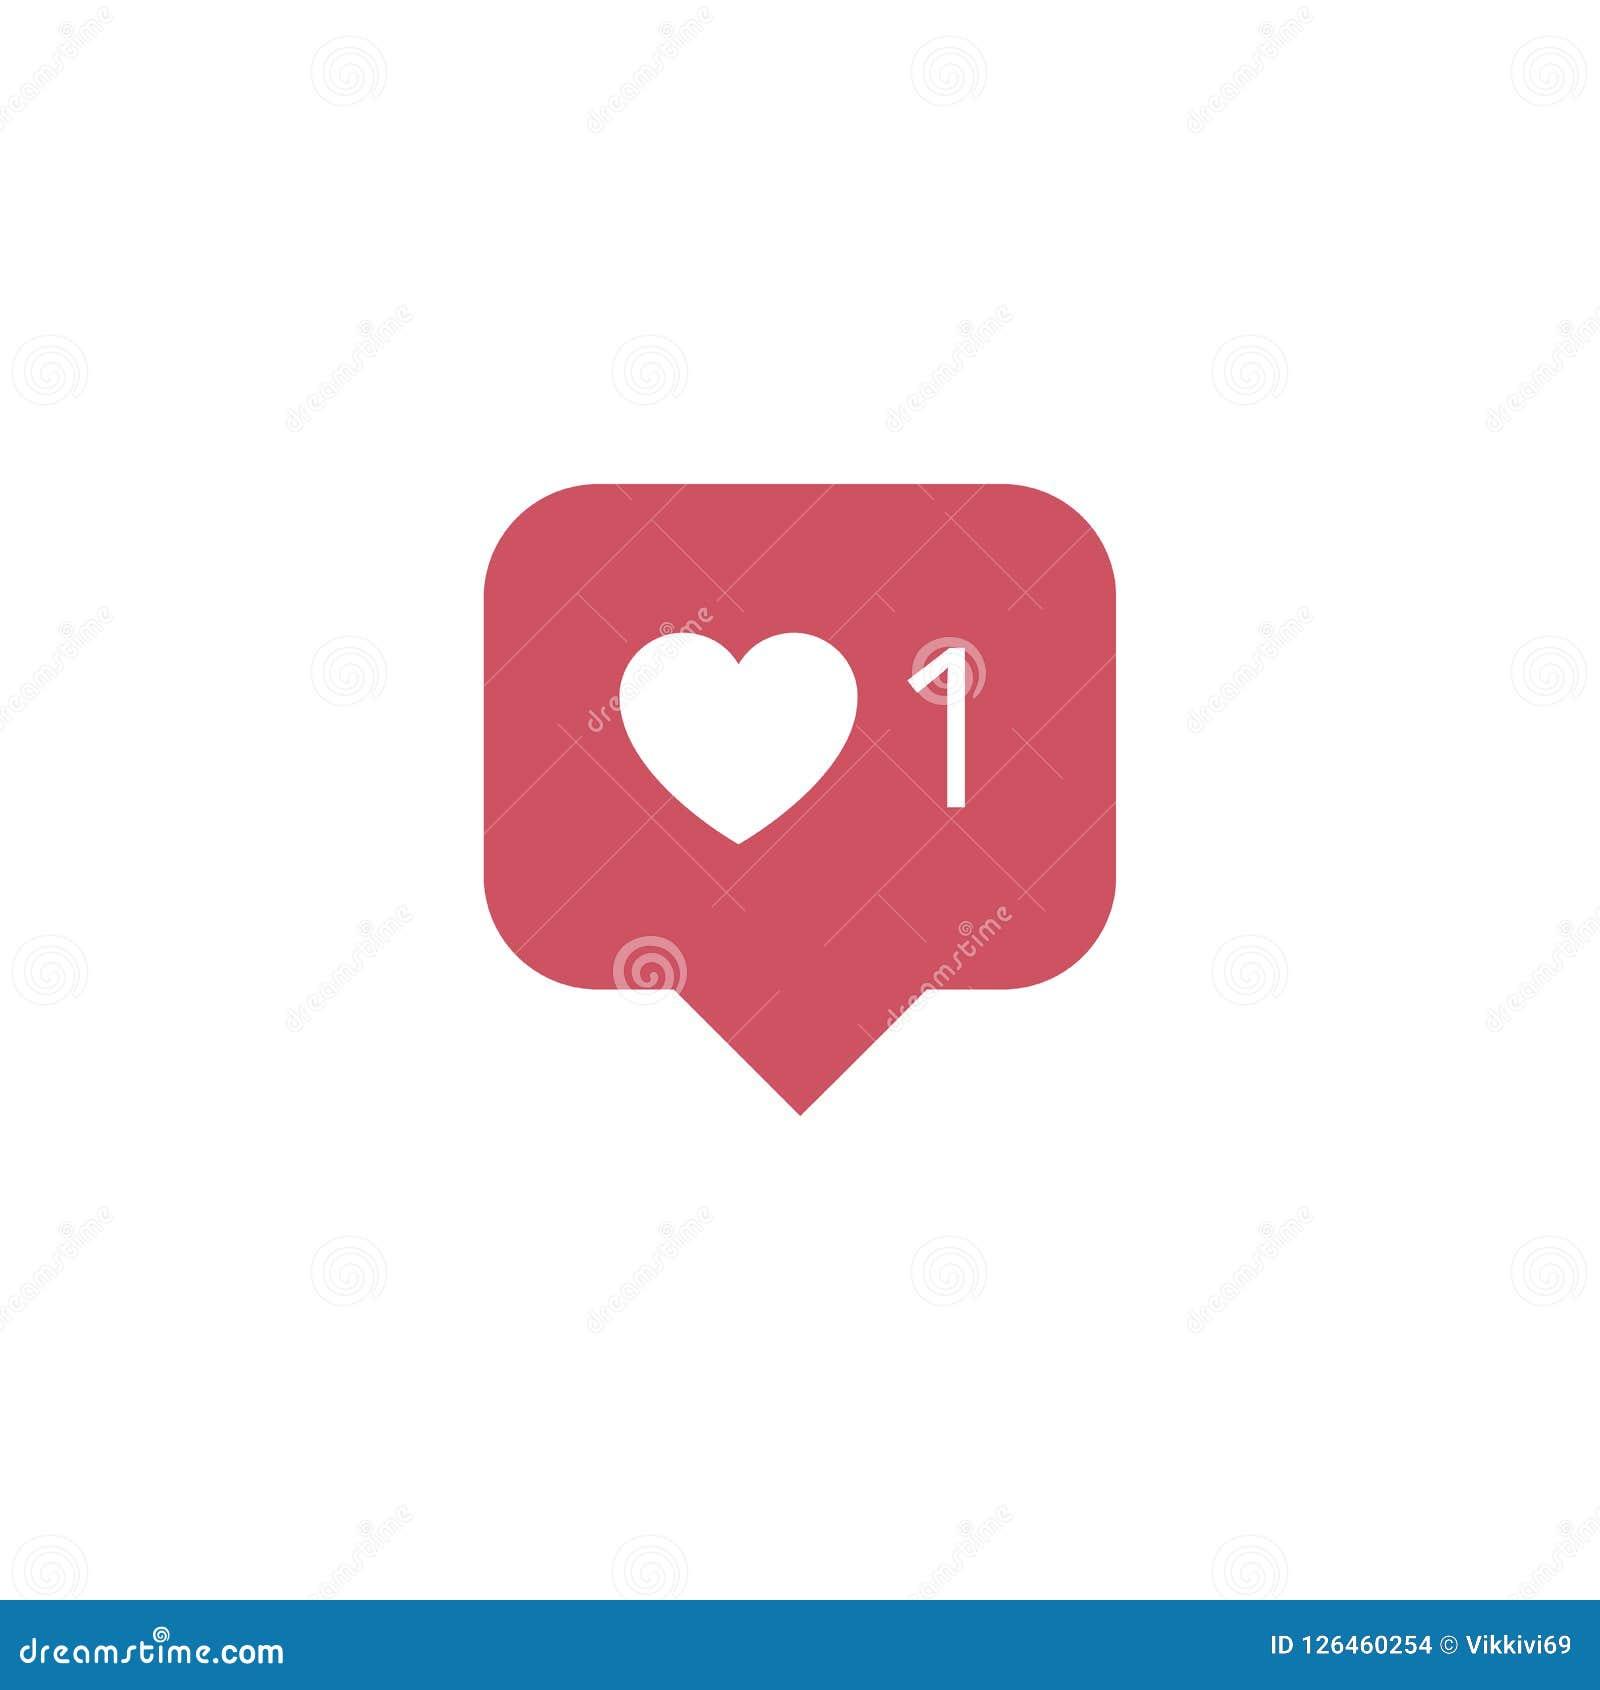 Vector Illustration Instagram: Instagram Notification Vector Icon. Follower. New Icon